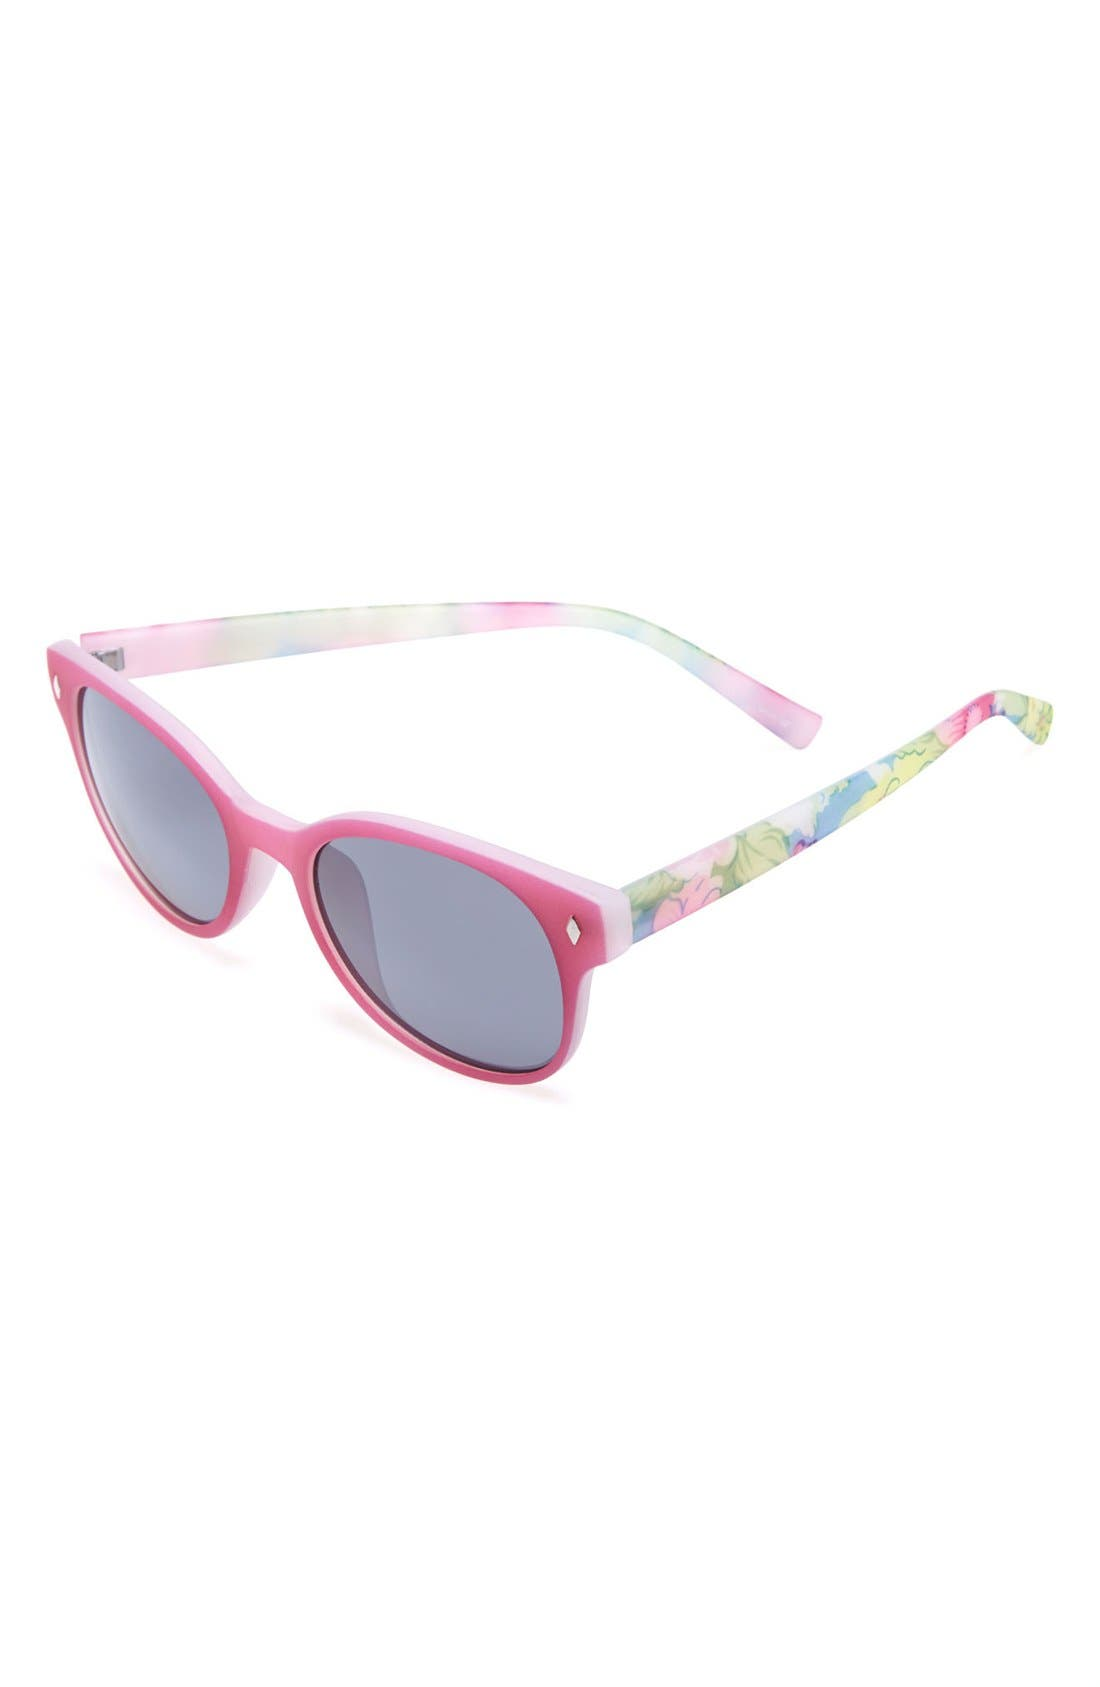 Alternate Image 1 Selected - Icon Eyewear Print Sunglasses (Girls)